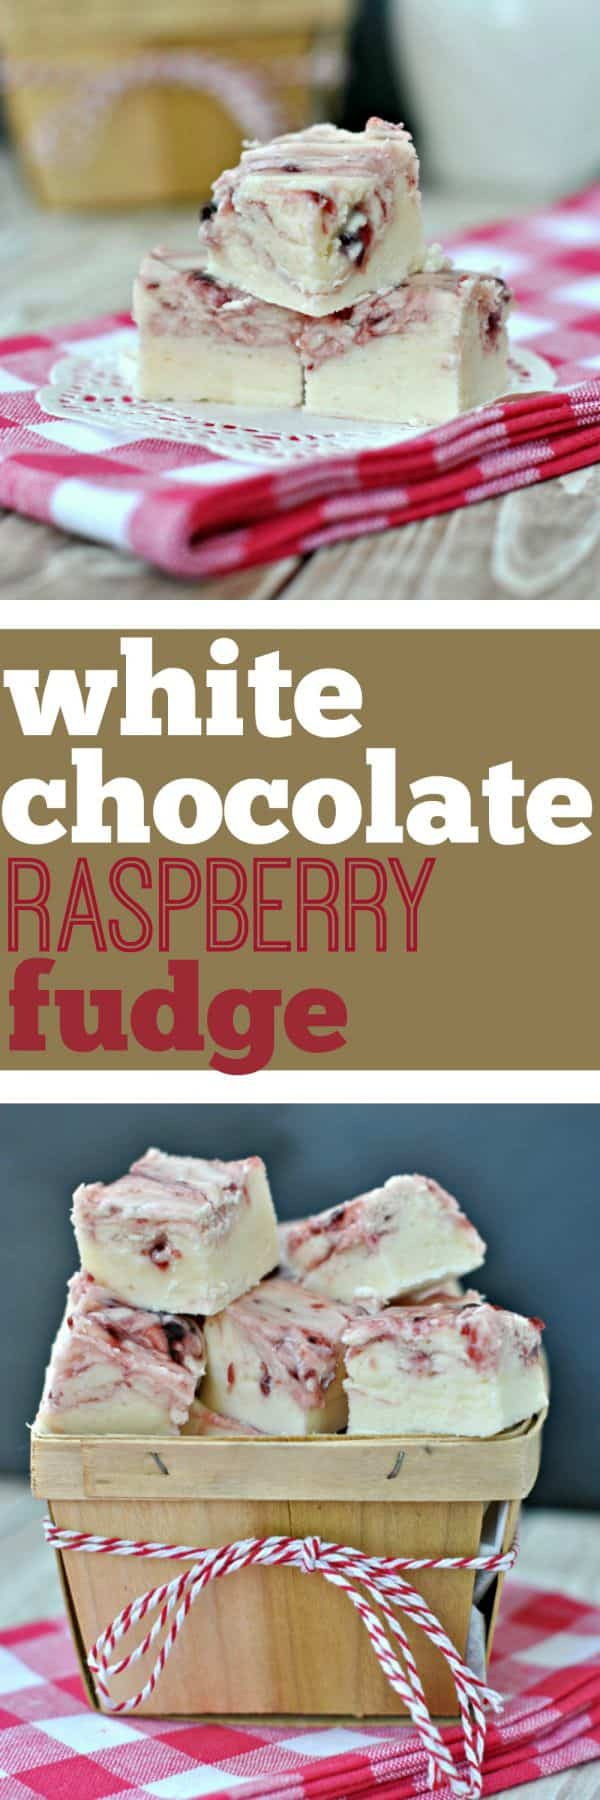 White Chocolate Raspberry Fudge - Shugary Sweets